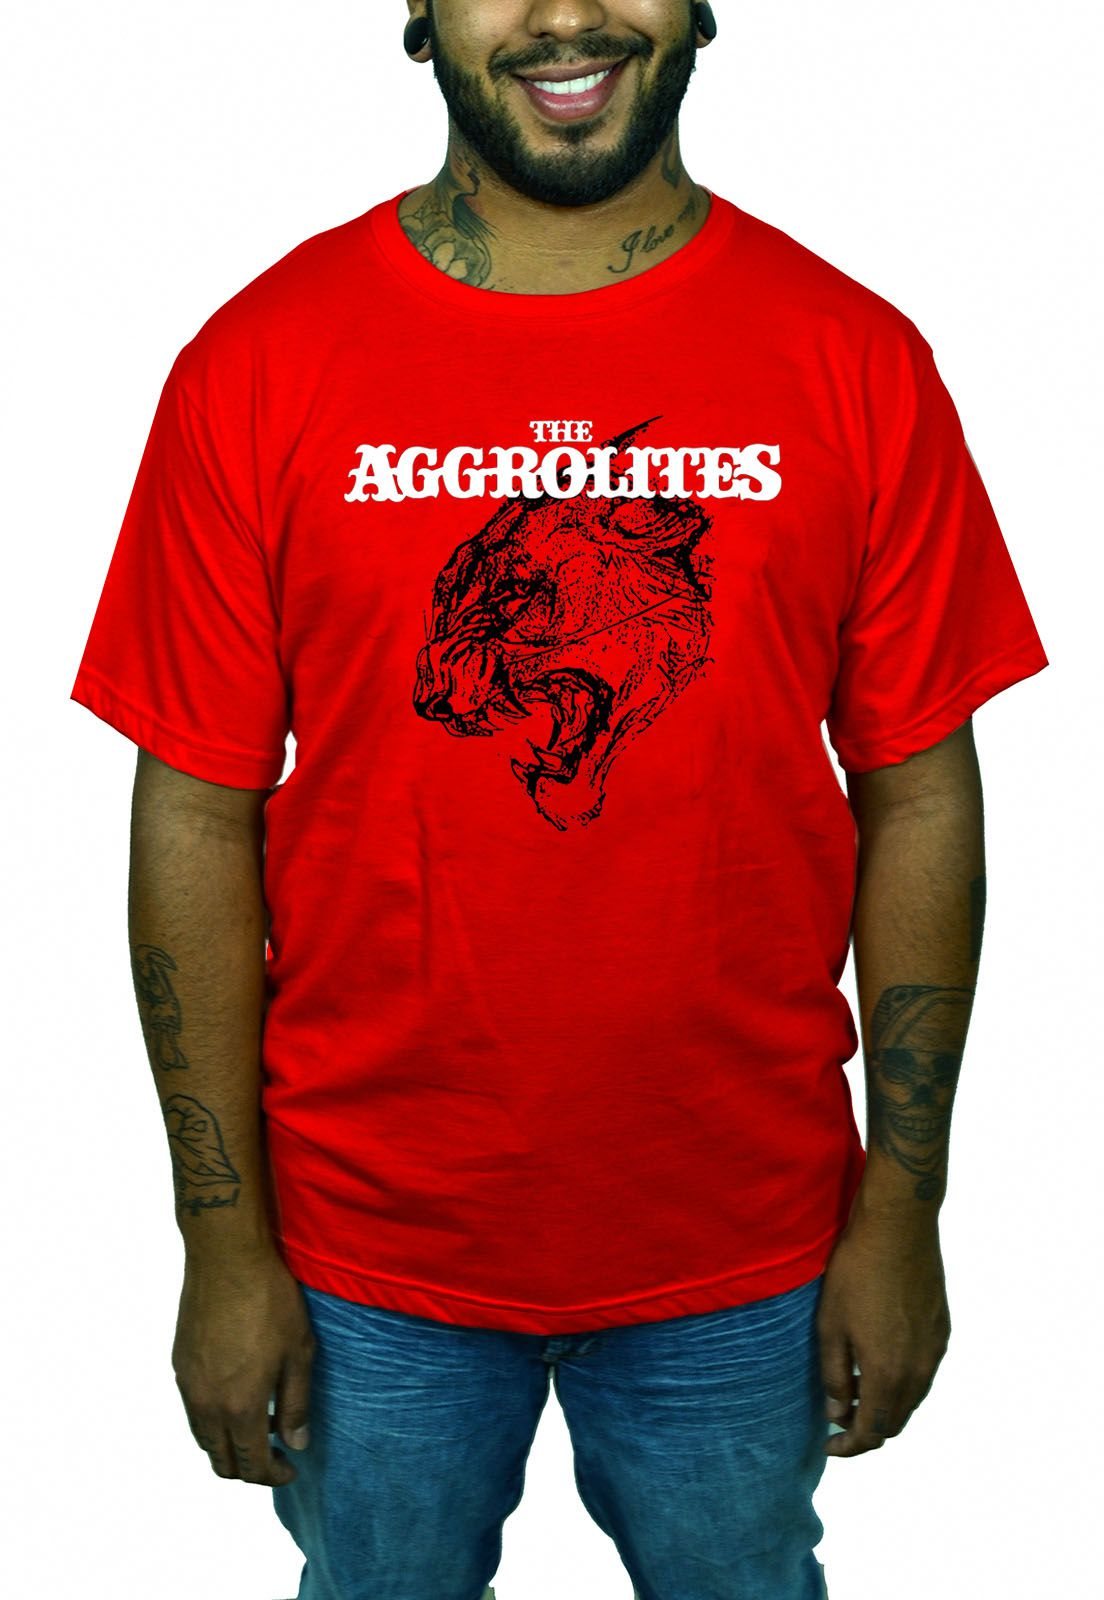 Camiseta Aggrolites - Vermelha  - HShop